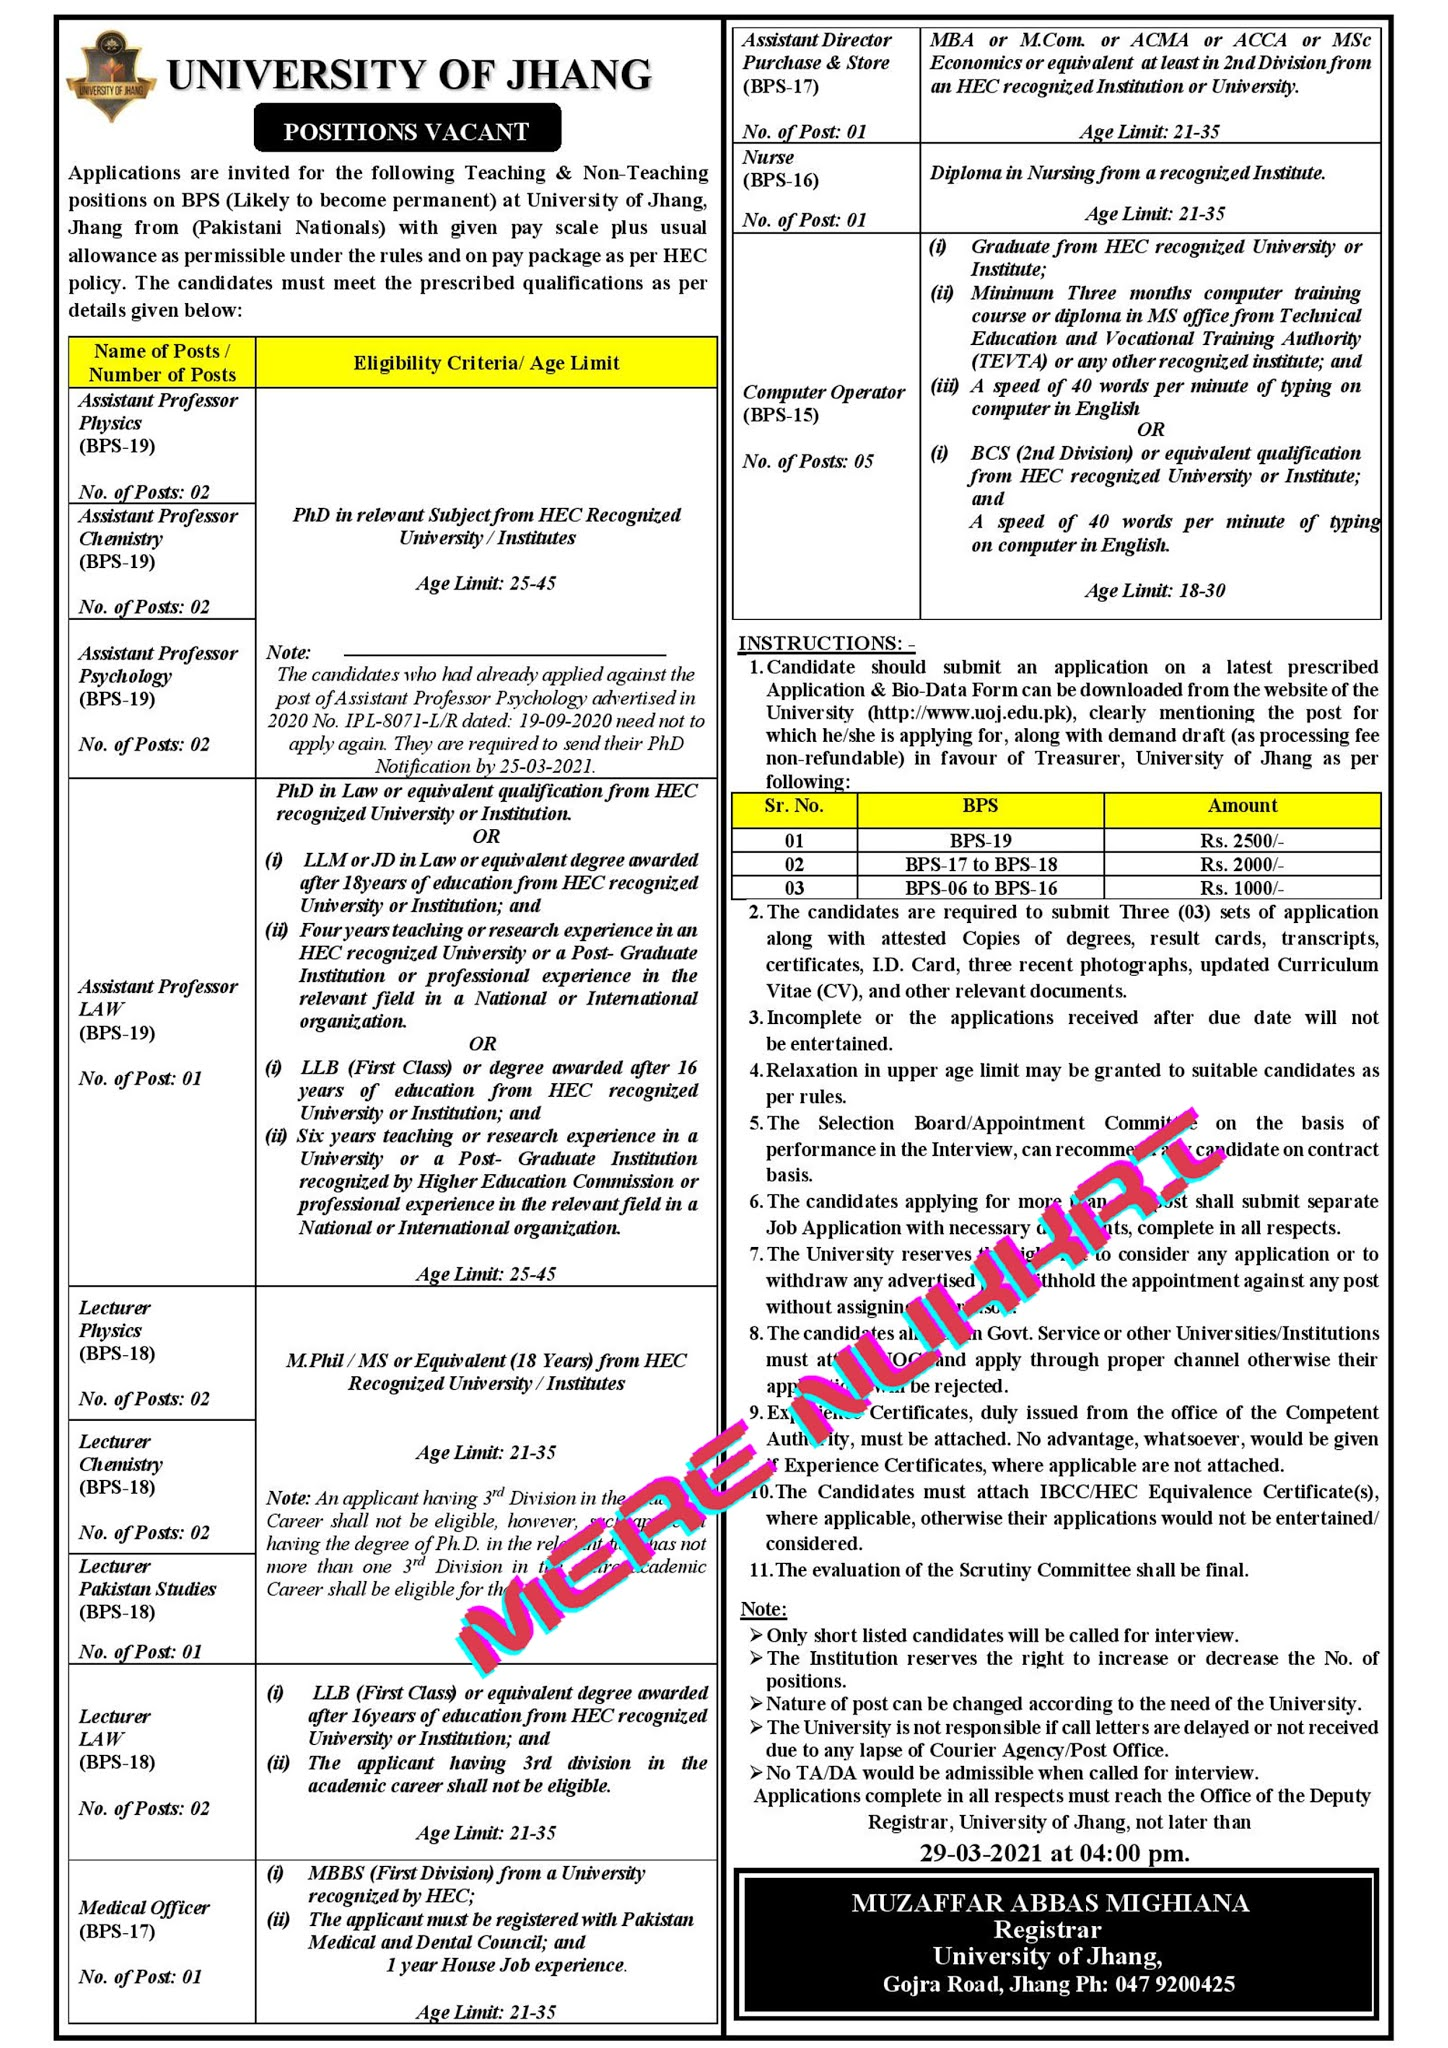 University of Jhang Jobs 2021 Latest Advertisement | Teaching & Non-Teaching positions